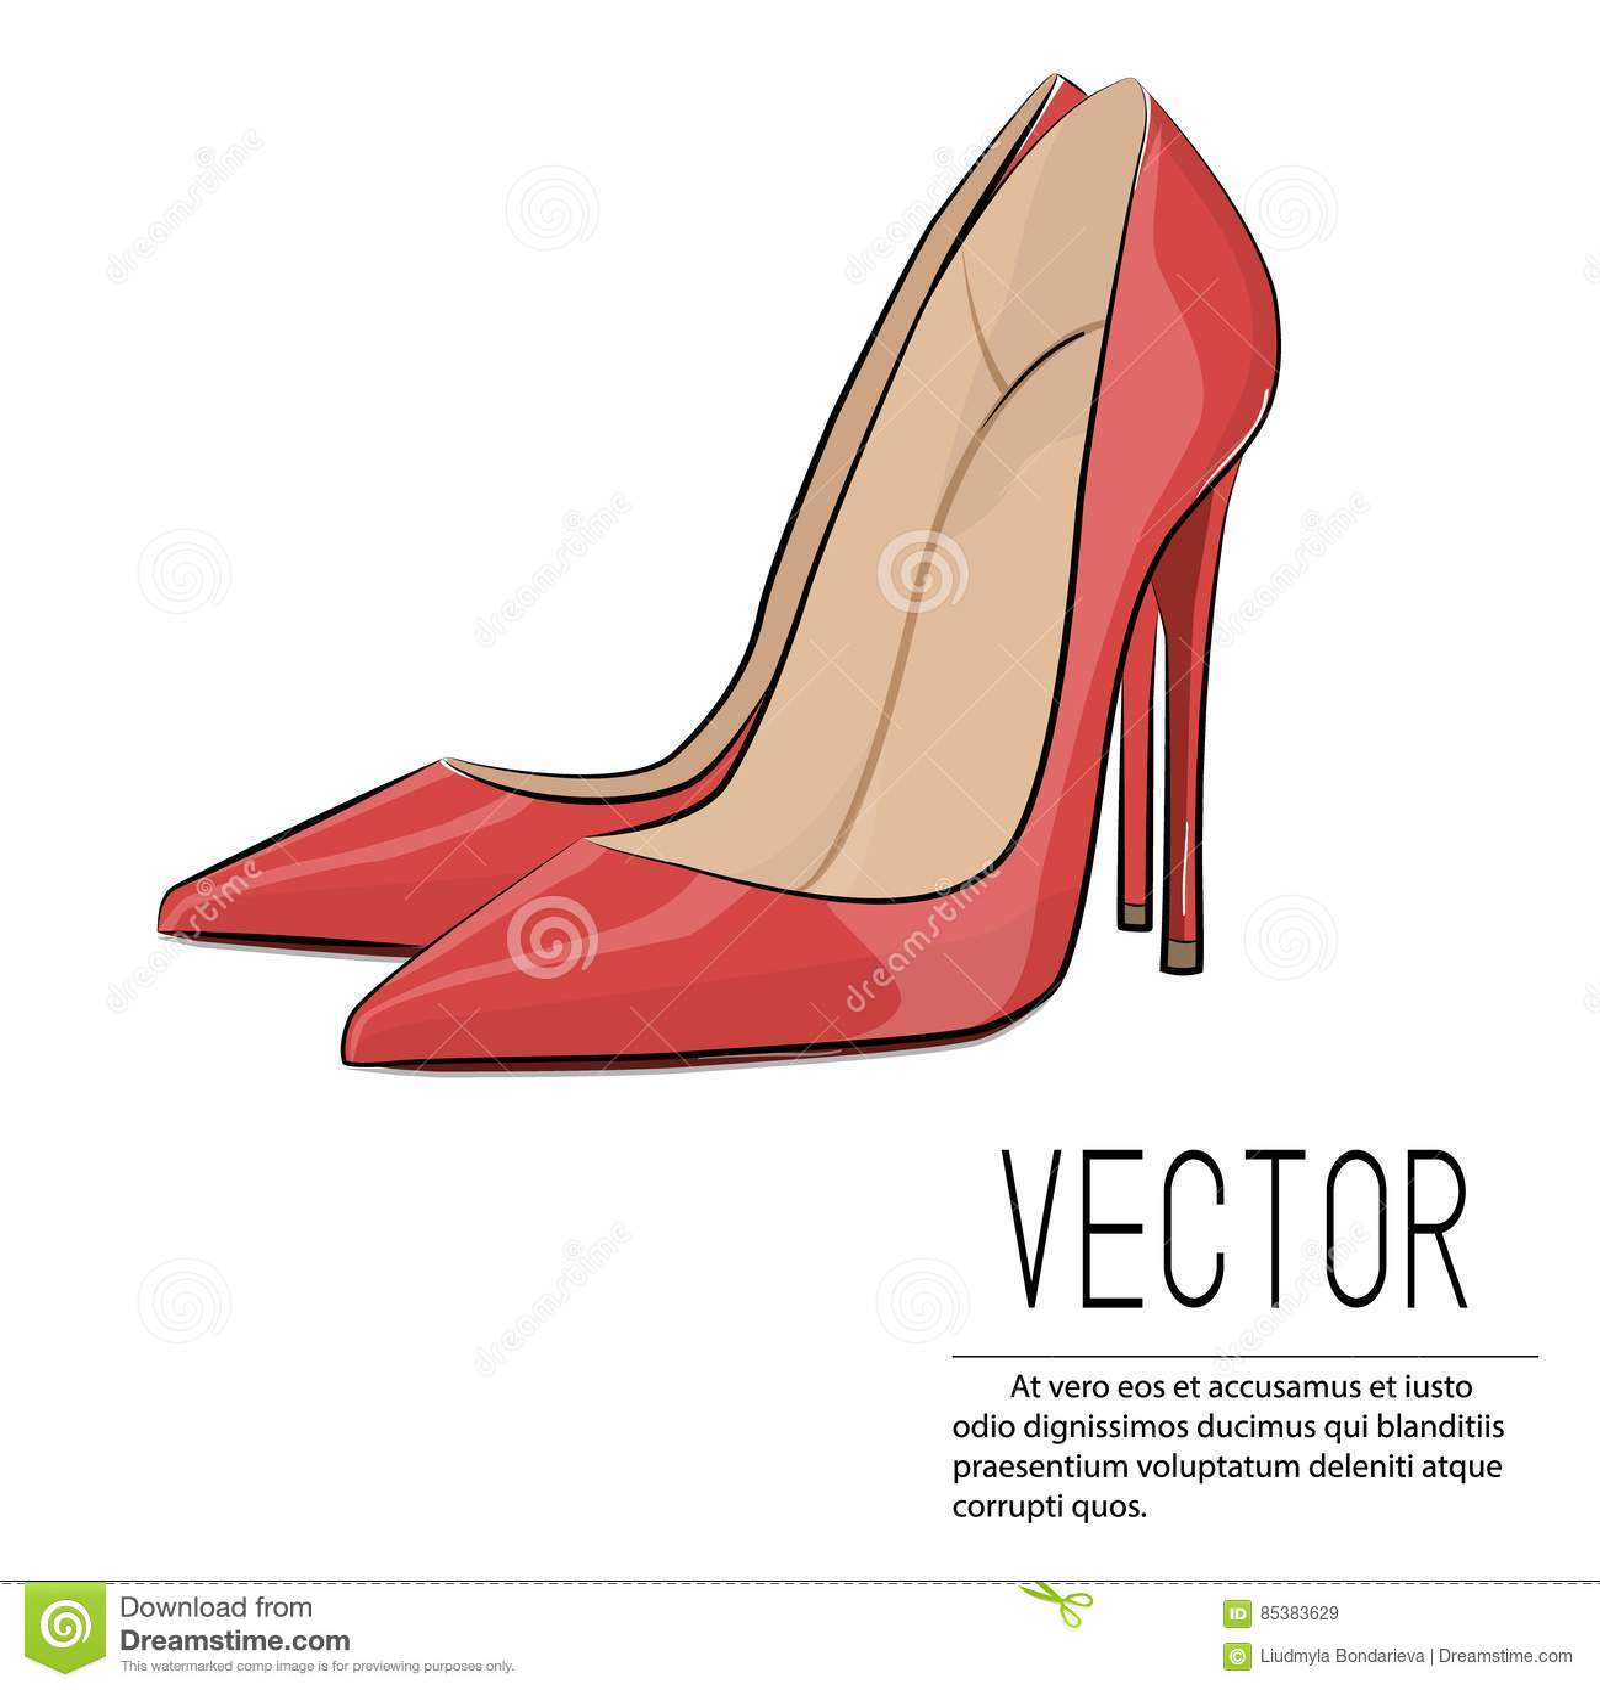 c3c377e3ef5 Vector Red Heels Fashion Illustration. Glamour Female High Heel ...